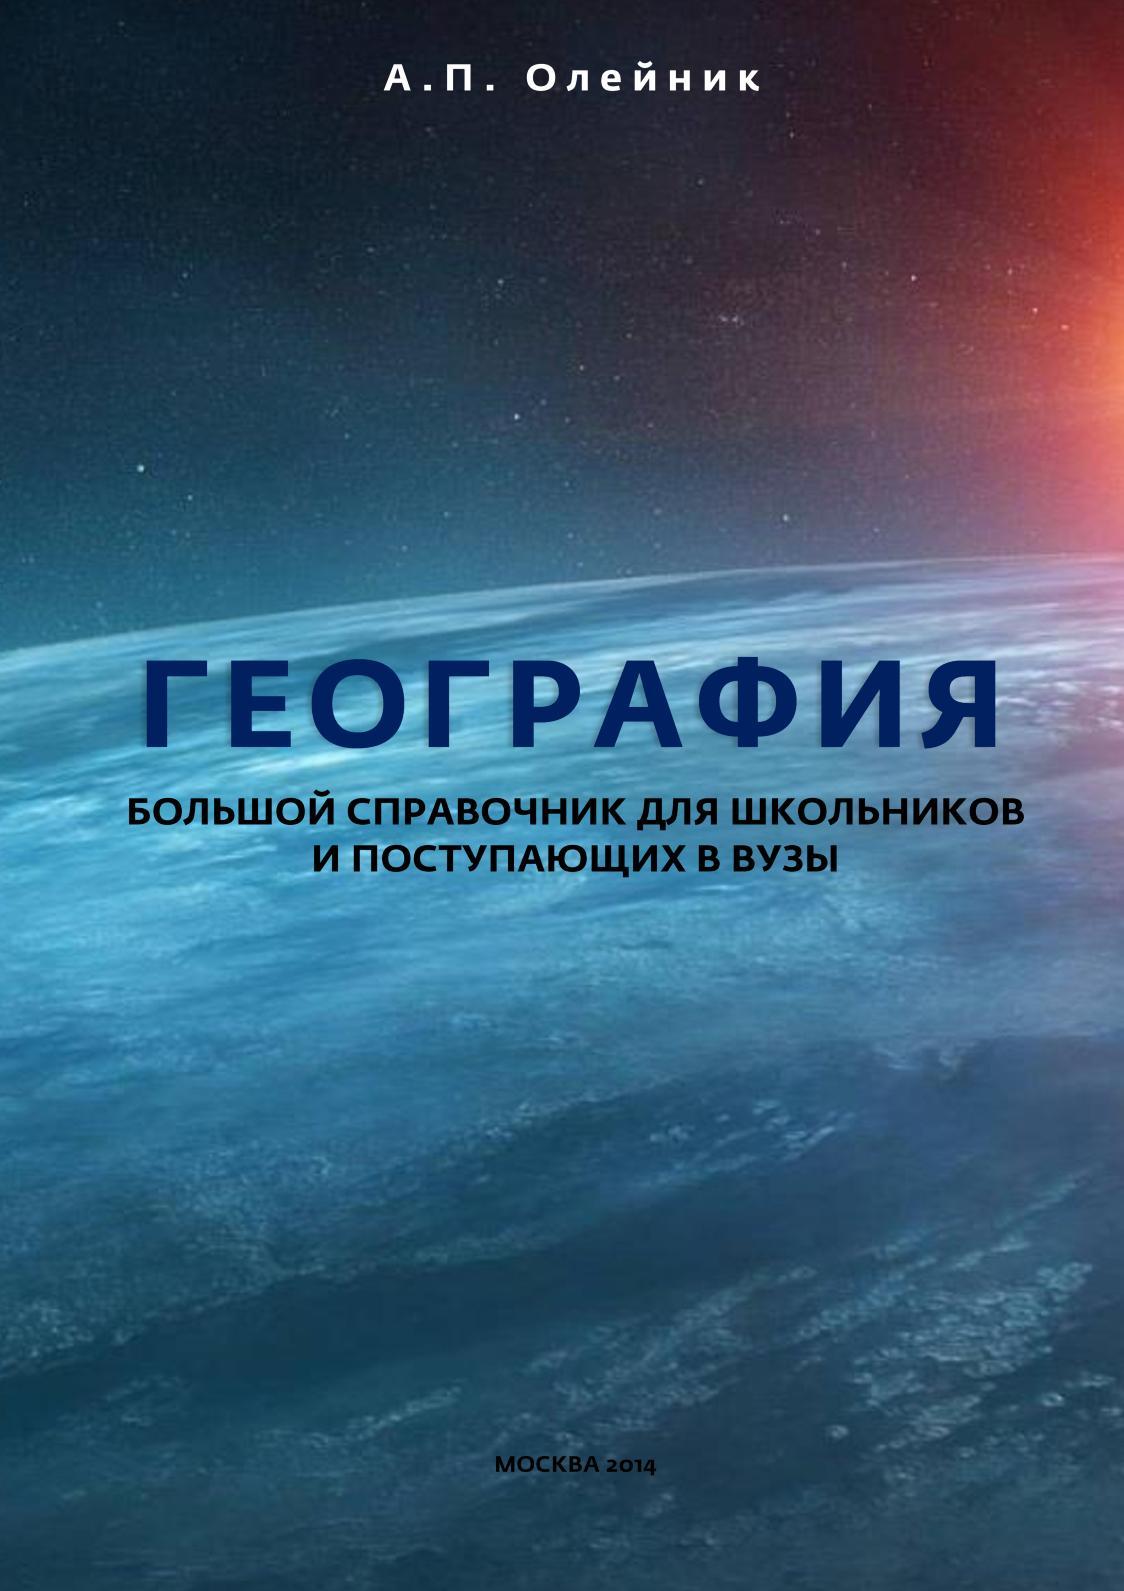 tur v rossiju ozero bajkal 13 822 rub chel 3 - Тур в Россию Озеро Байкал 13 822 руб. чел.